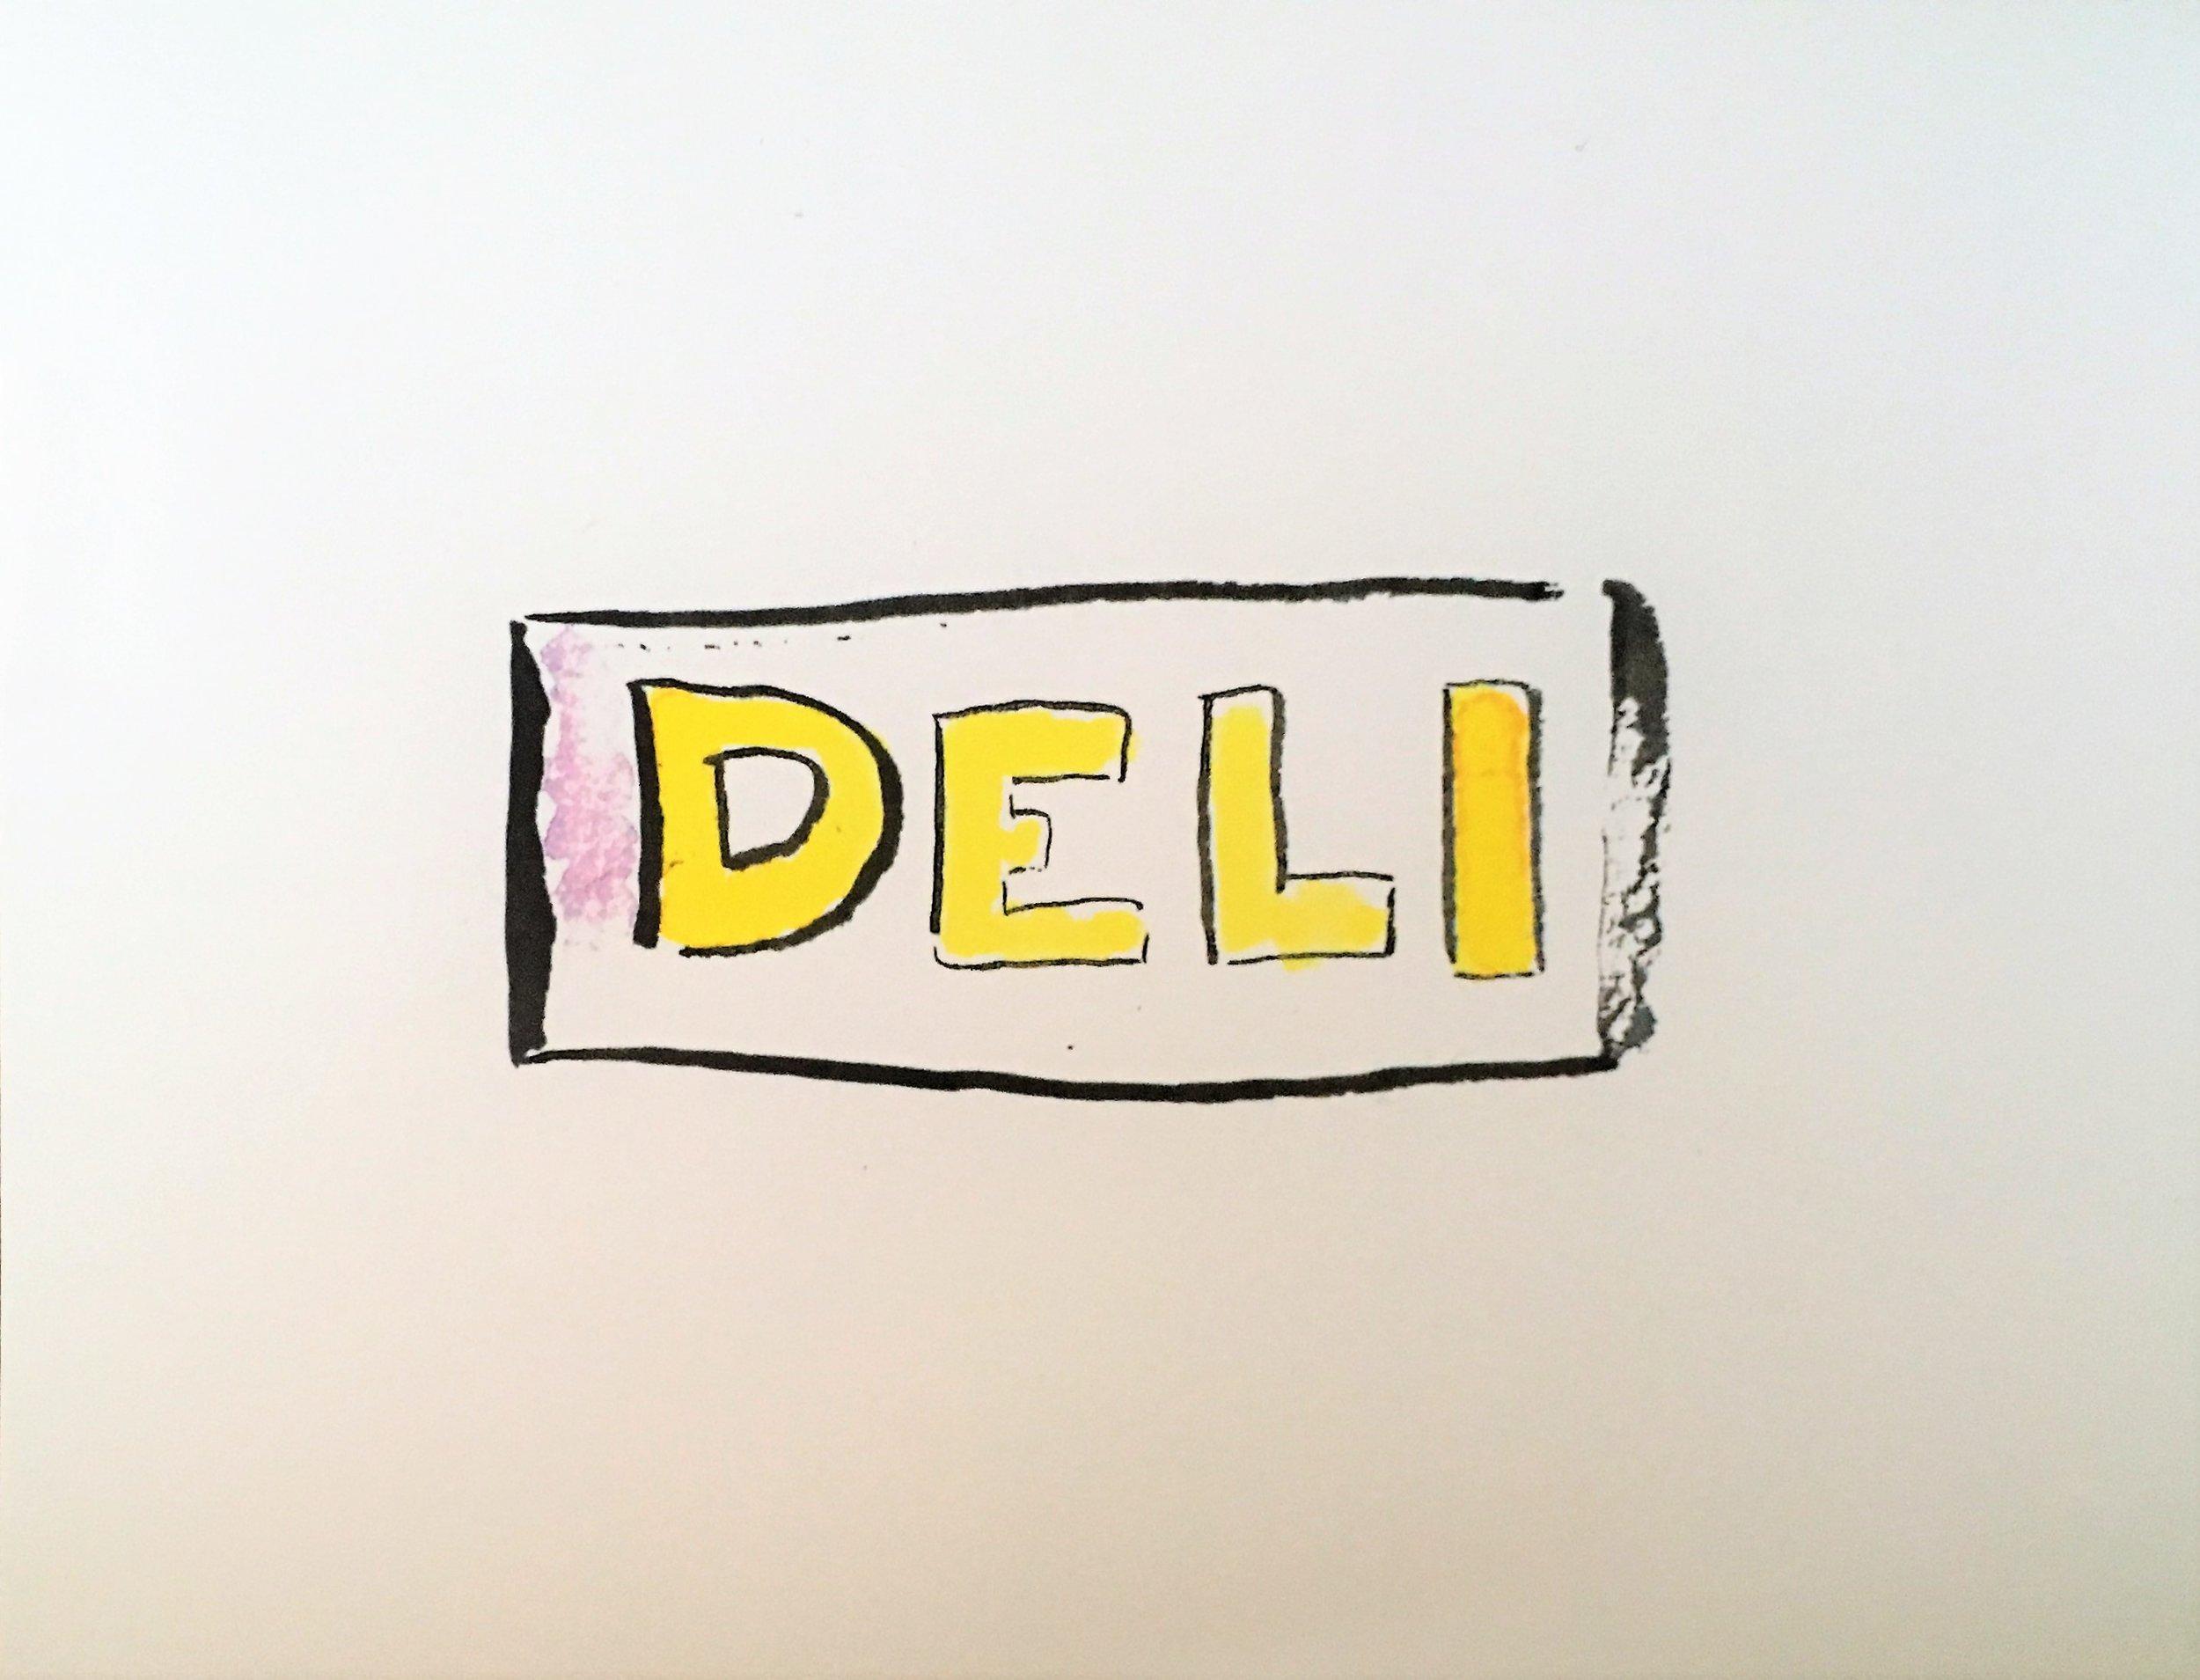 Deli, inside image